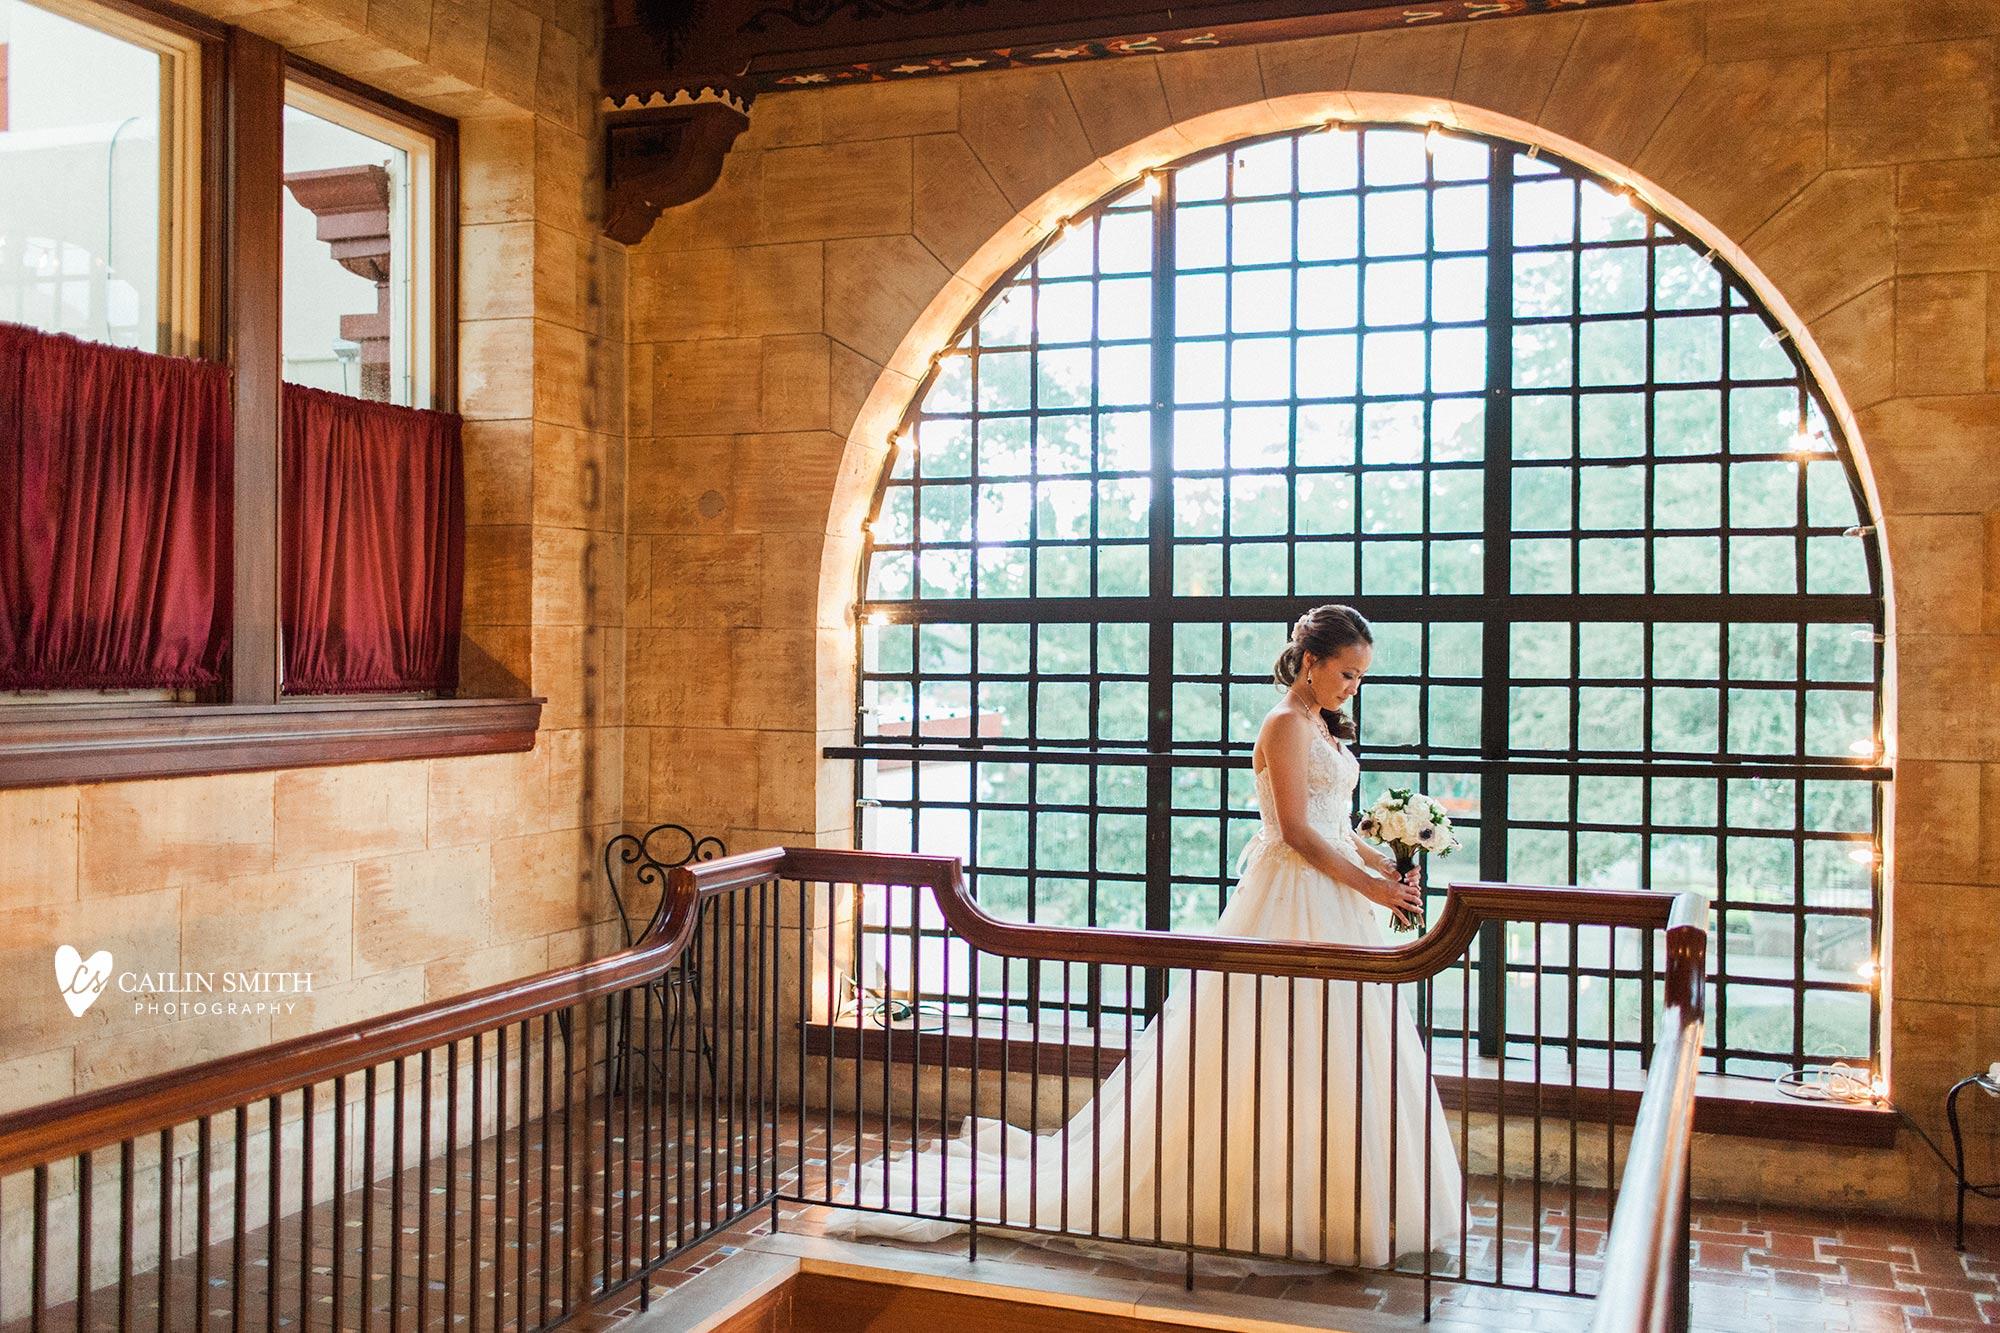 Jenifer_Dewey_Treasury_on_The_Plaza_Wedding_Photography_014.jpg